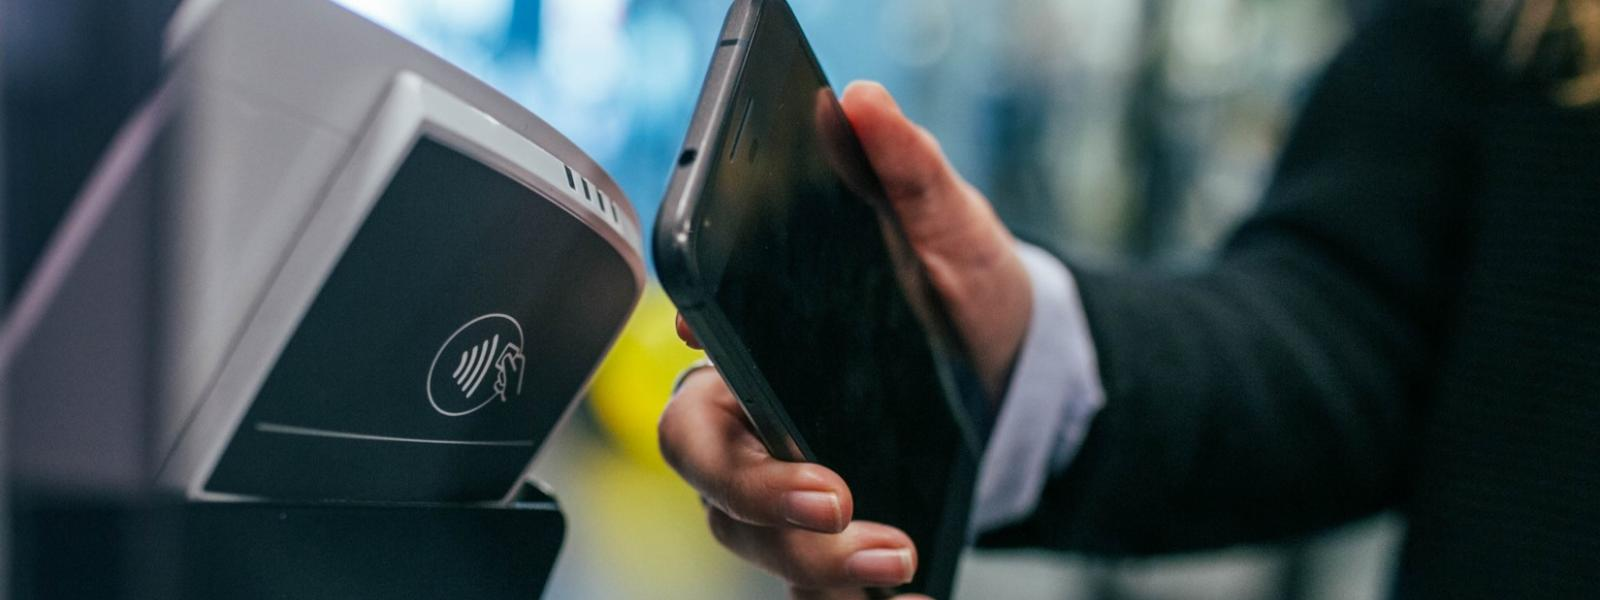 Paragon ID invest in airweb